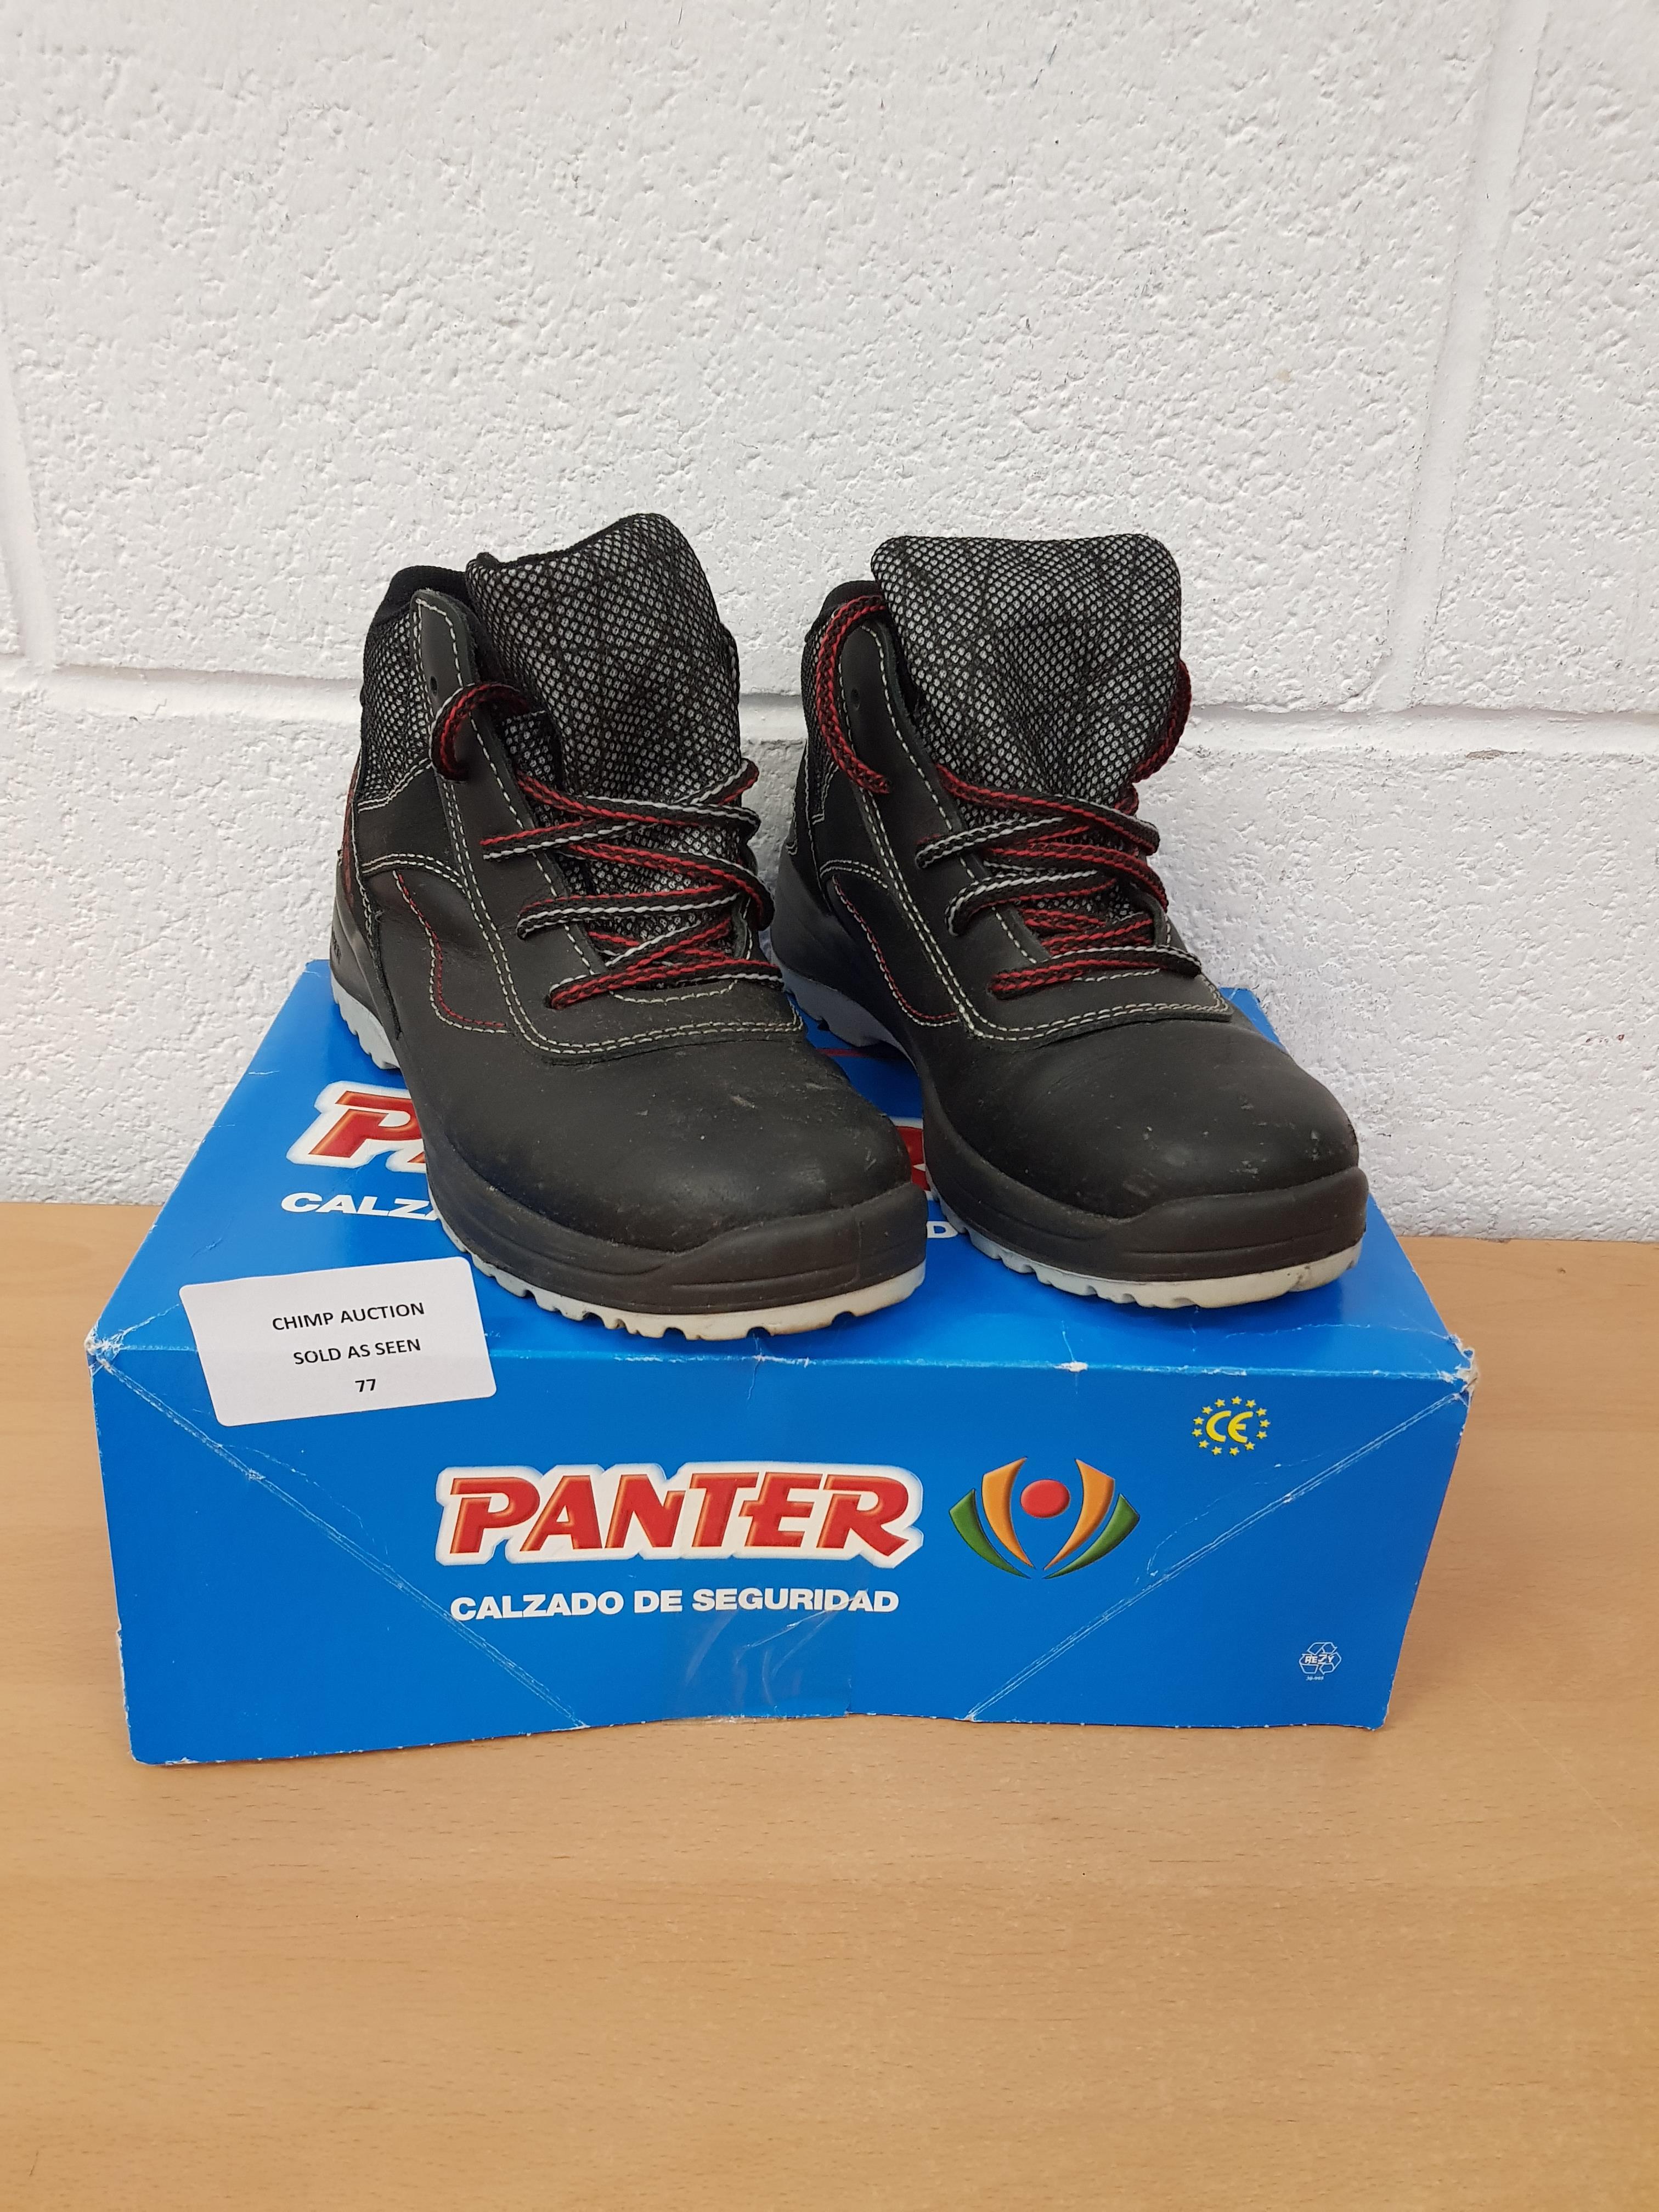 Lot 77 - Panter kids shoes EU 38